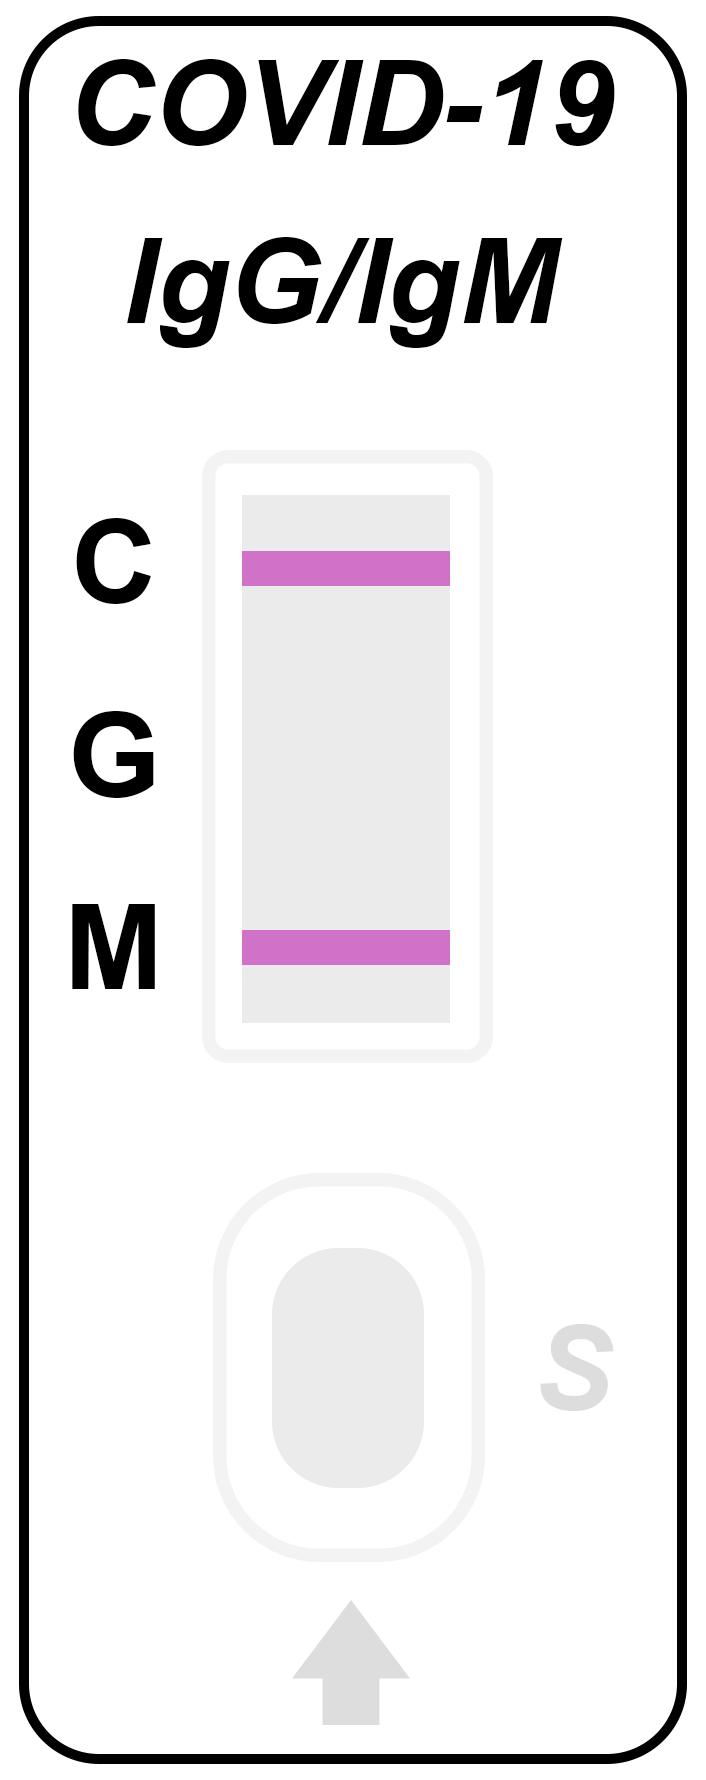 #3 IgM Positive